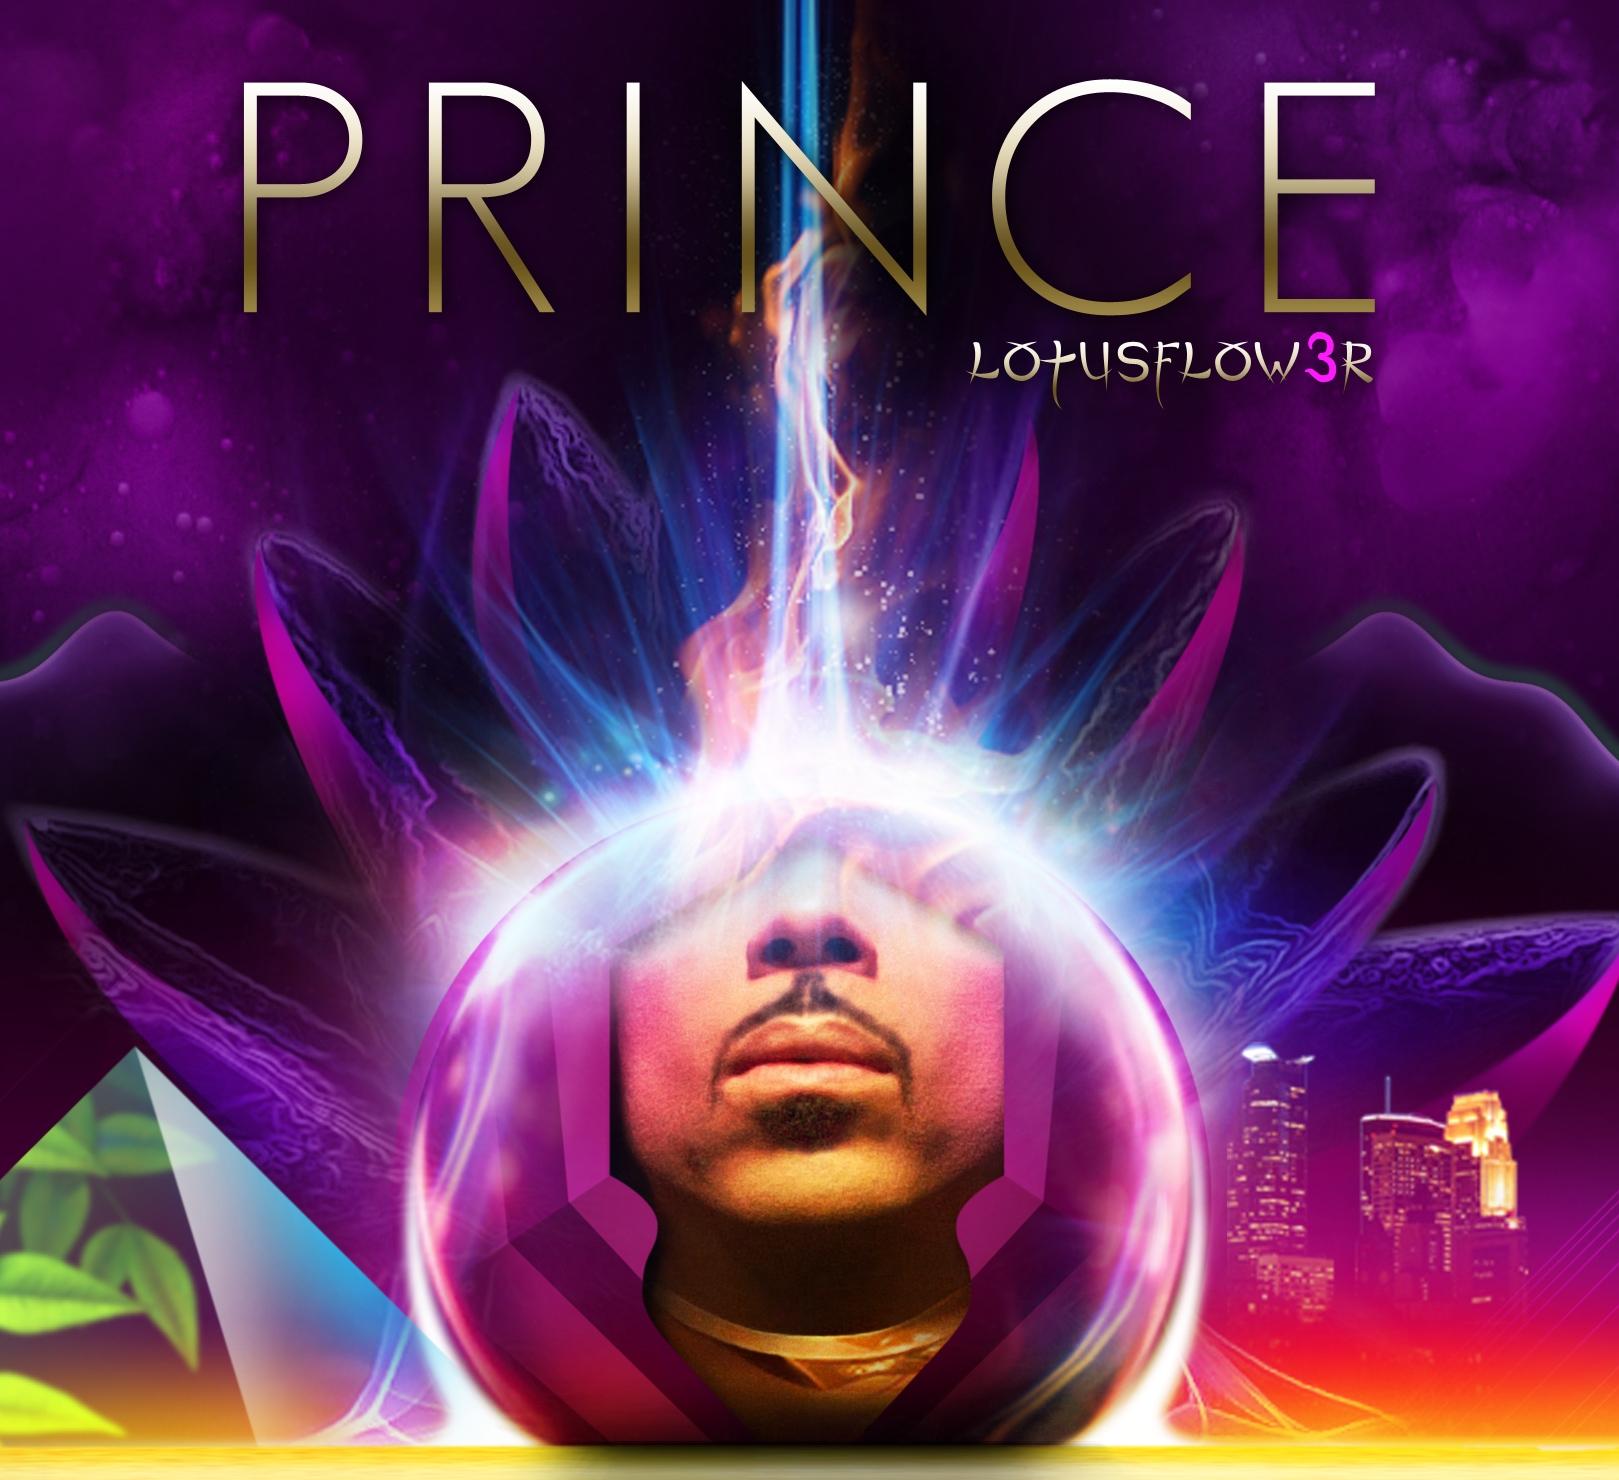 princelotusflow3rcoverart